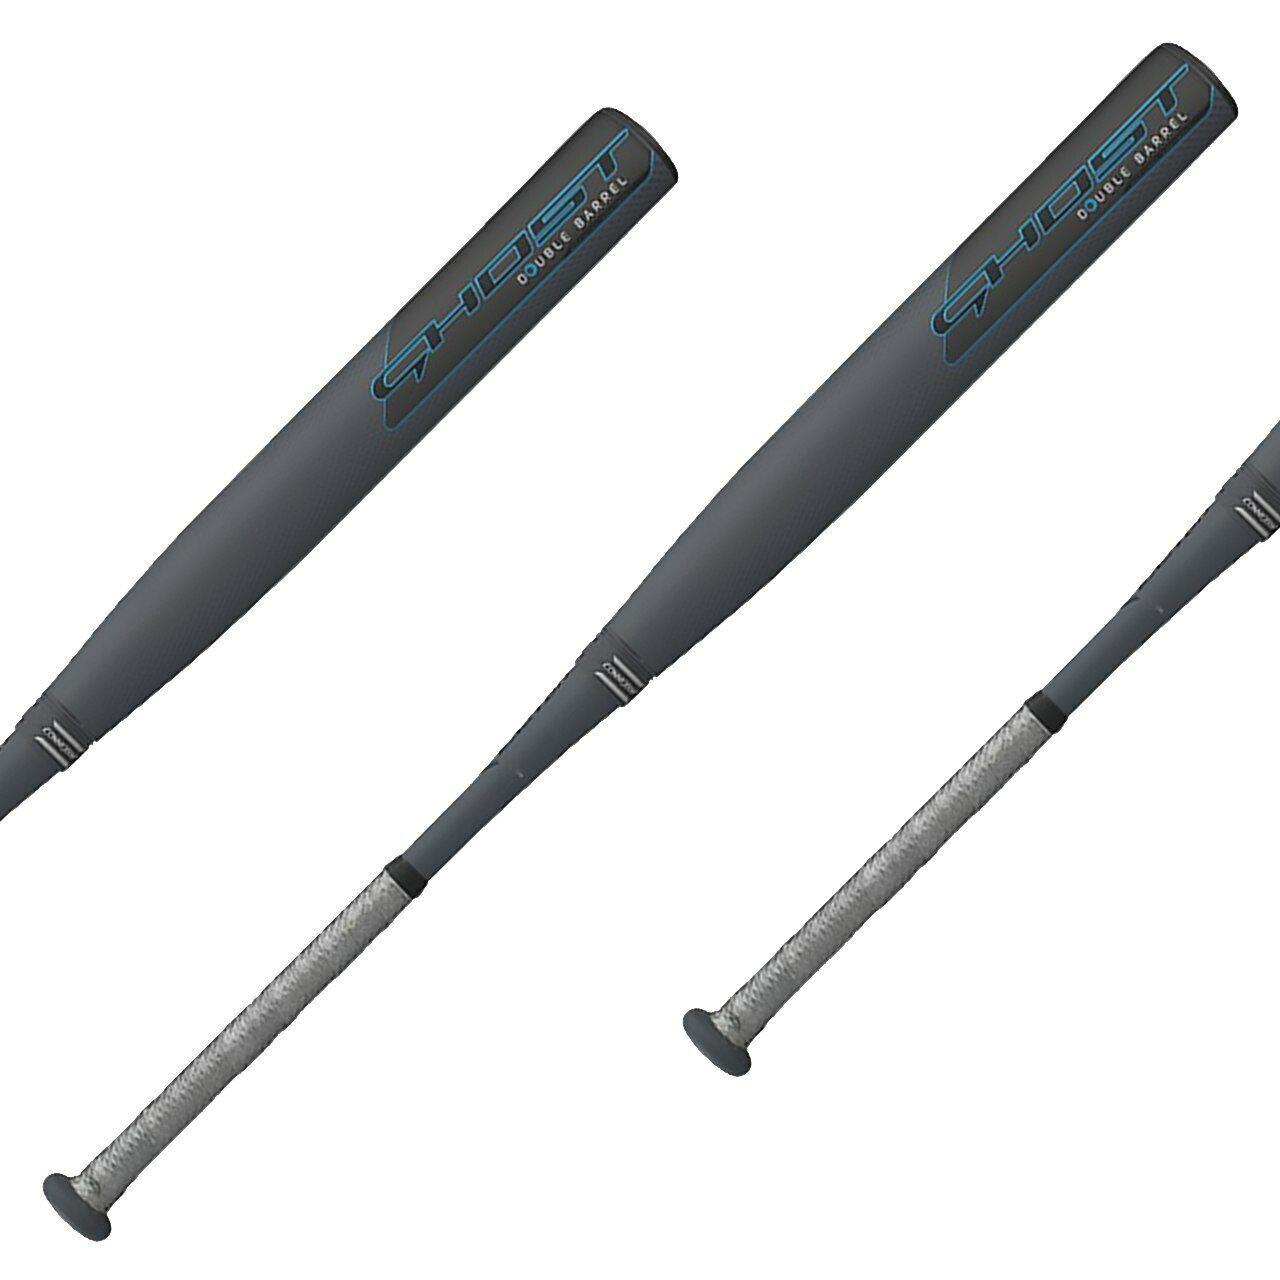 Easton Ghost Double Barrel -10 Fastpitch Softball Bat 2 1 4  (NEW)